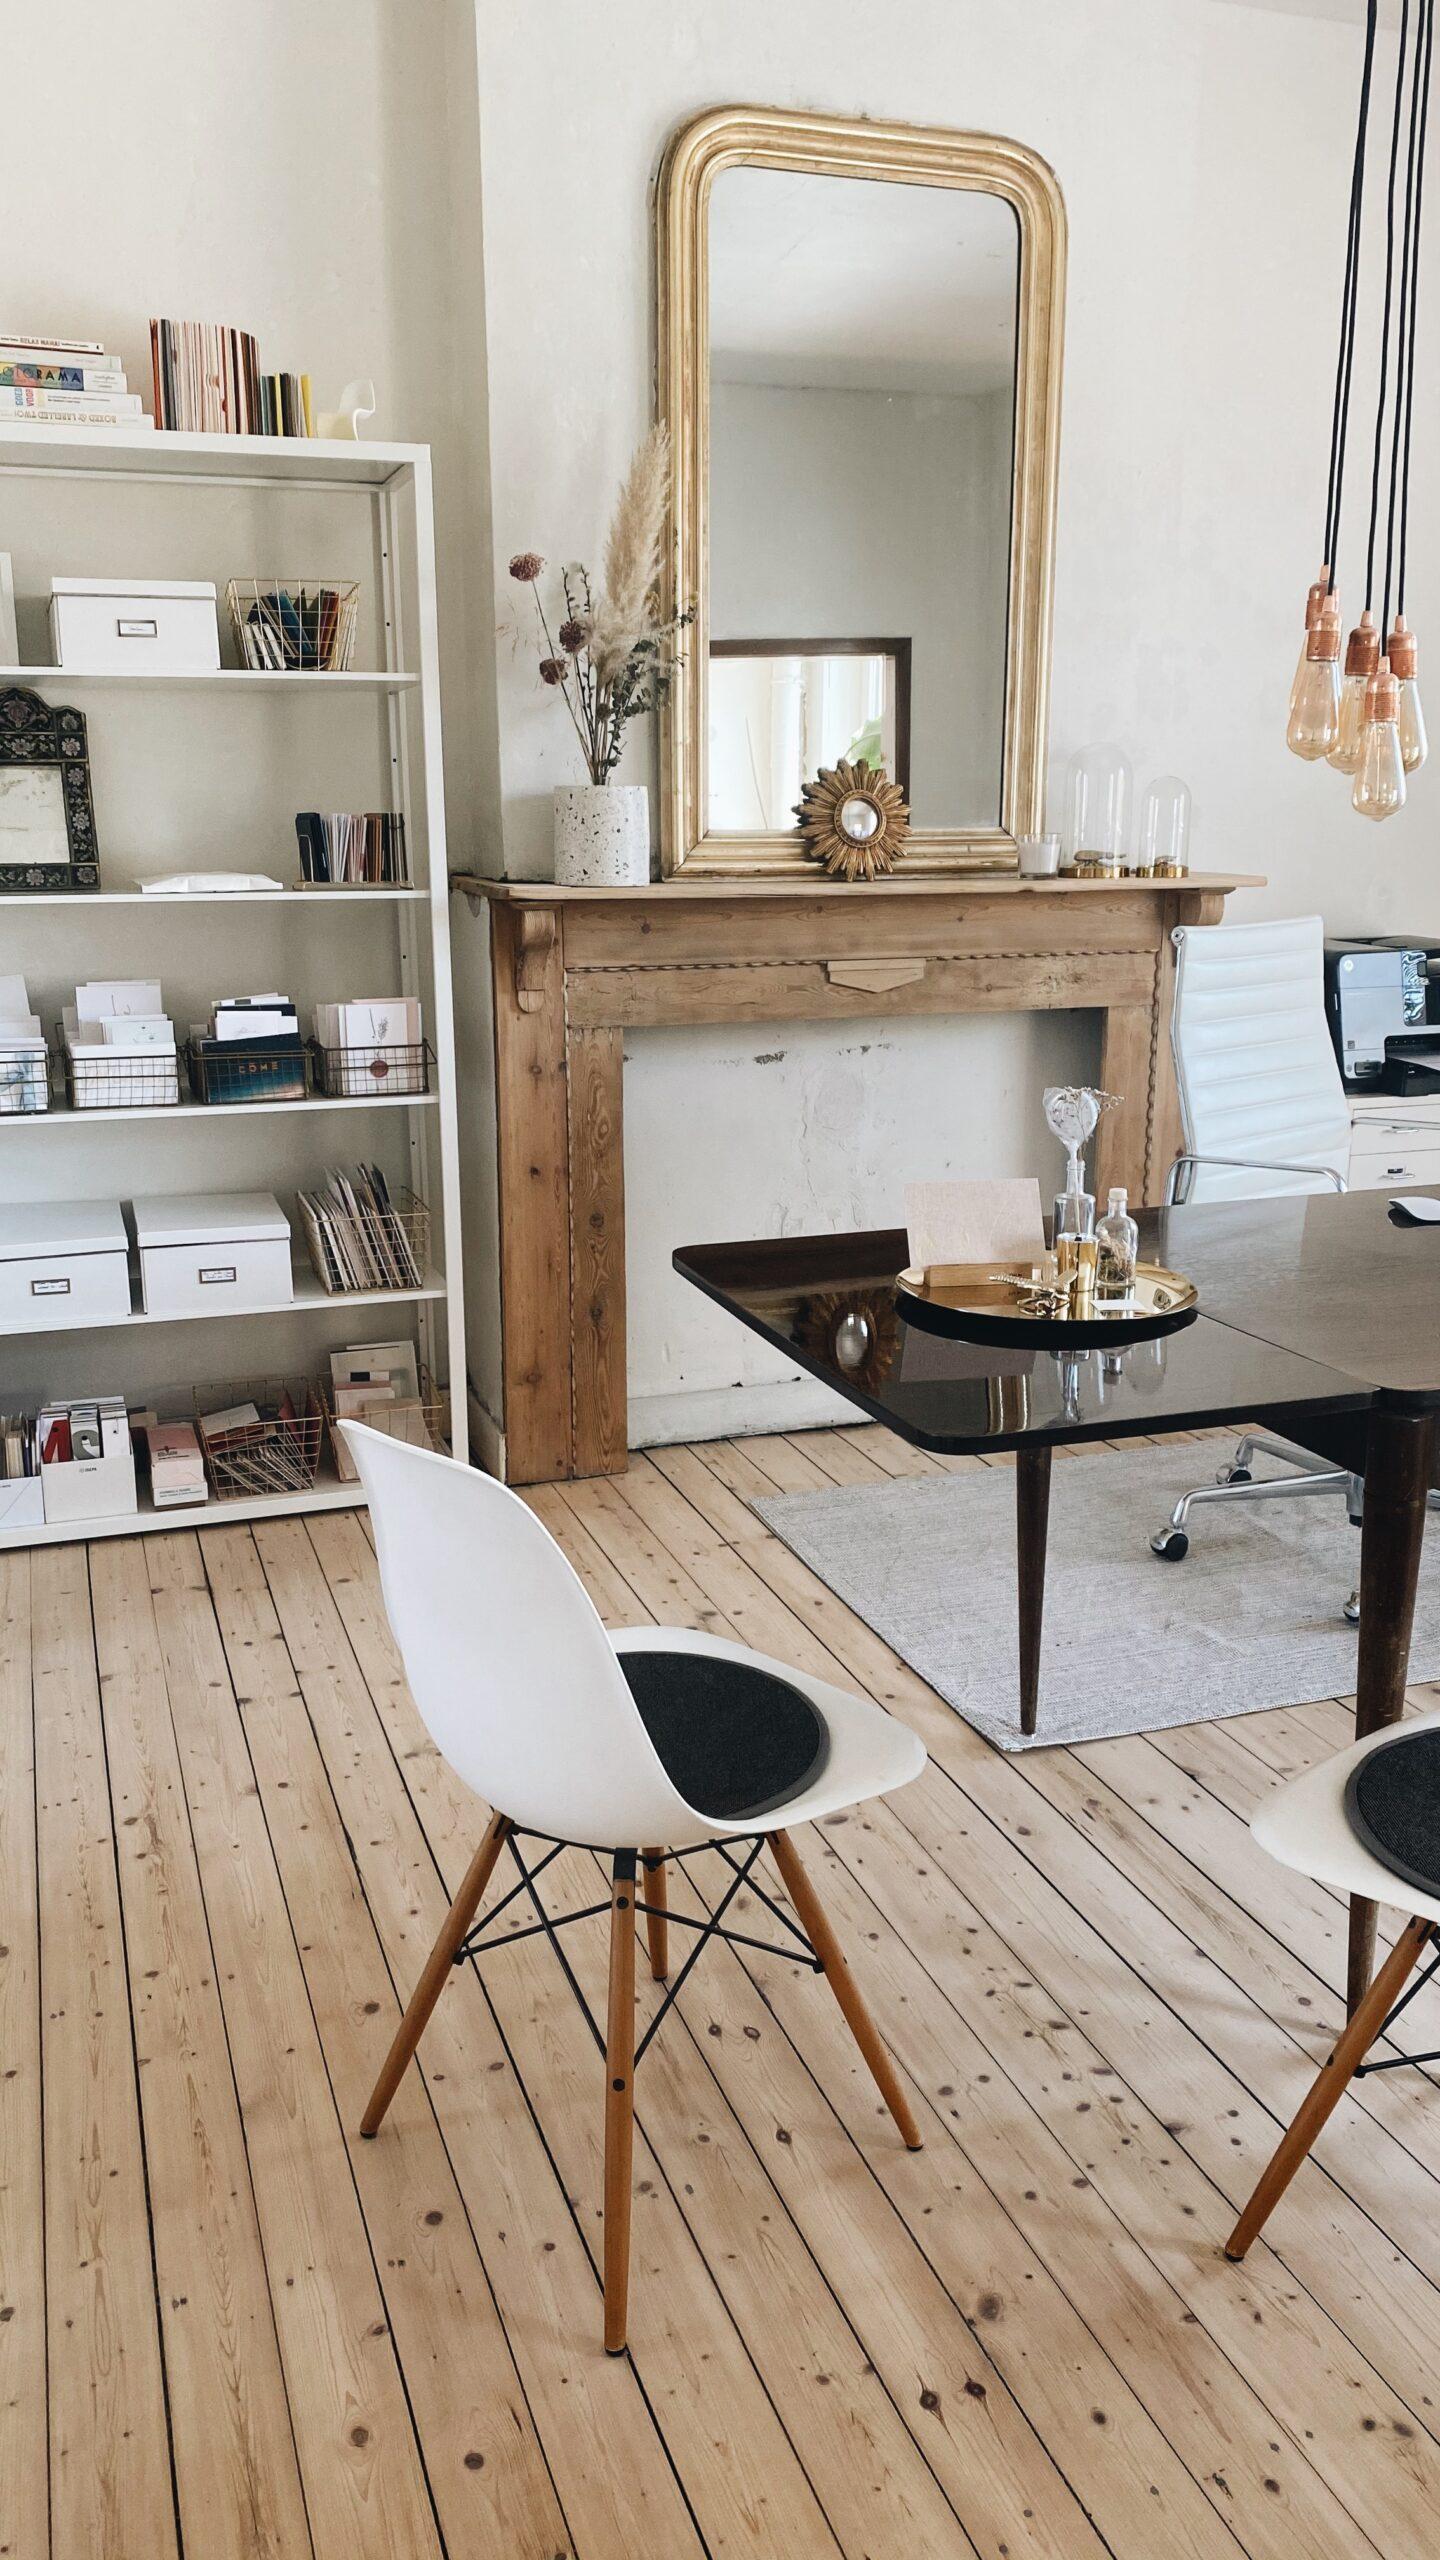 Studio Mustique interieur